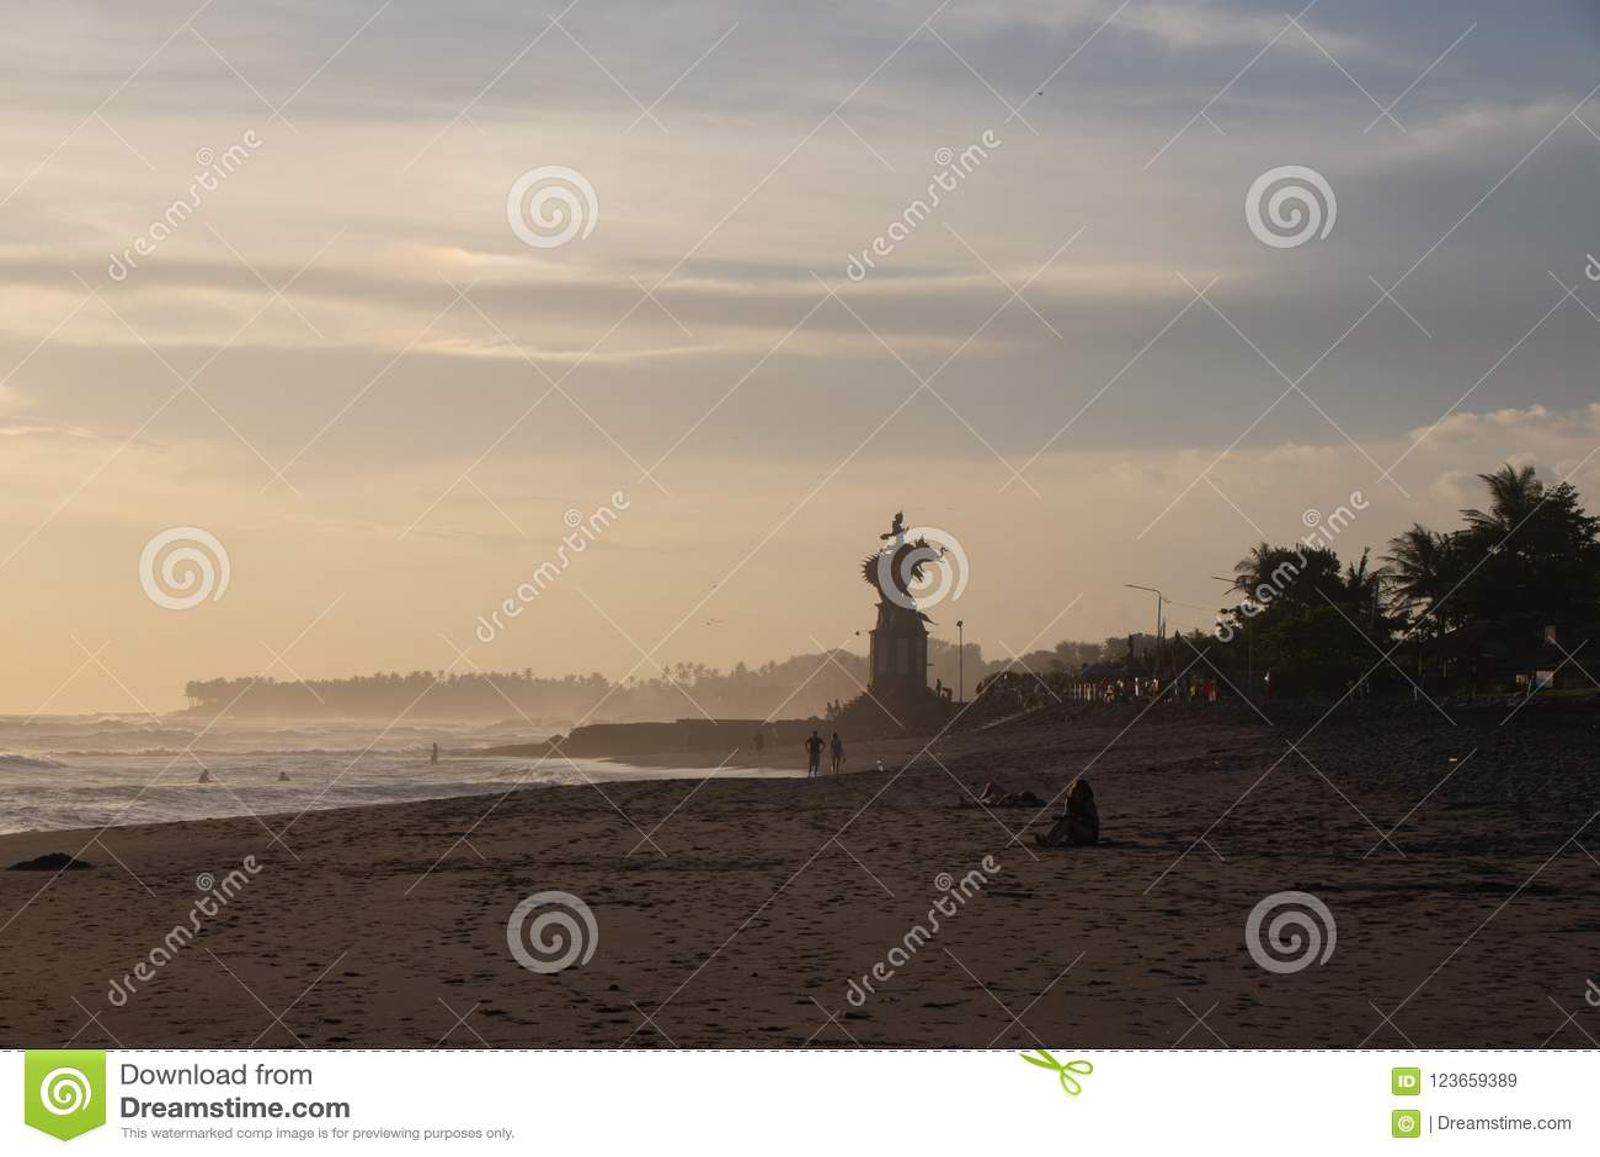 Beach at Canggu in Bali Indonesia at sunset or sunrise